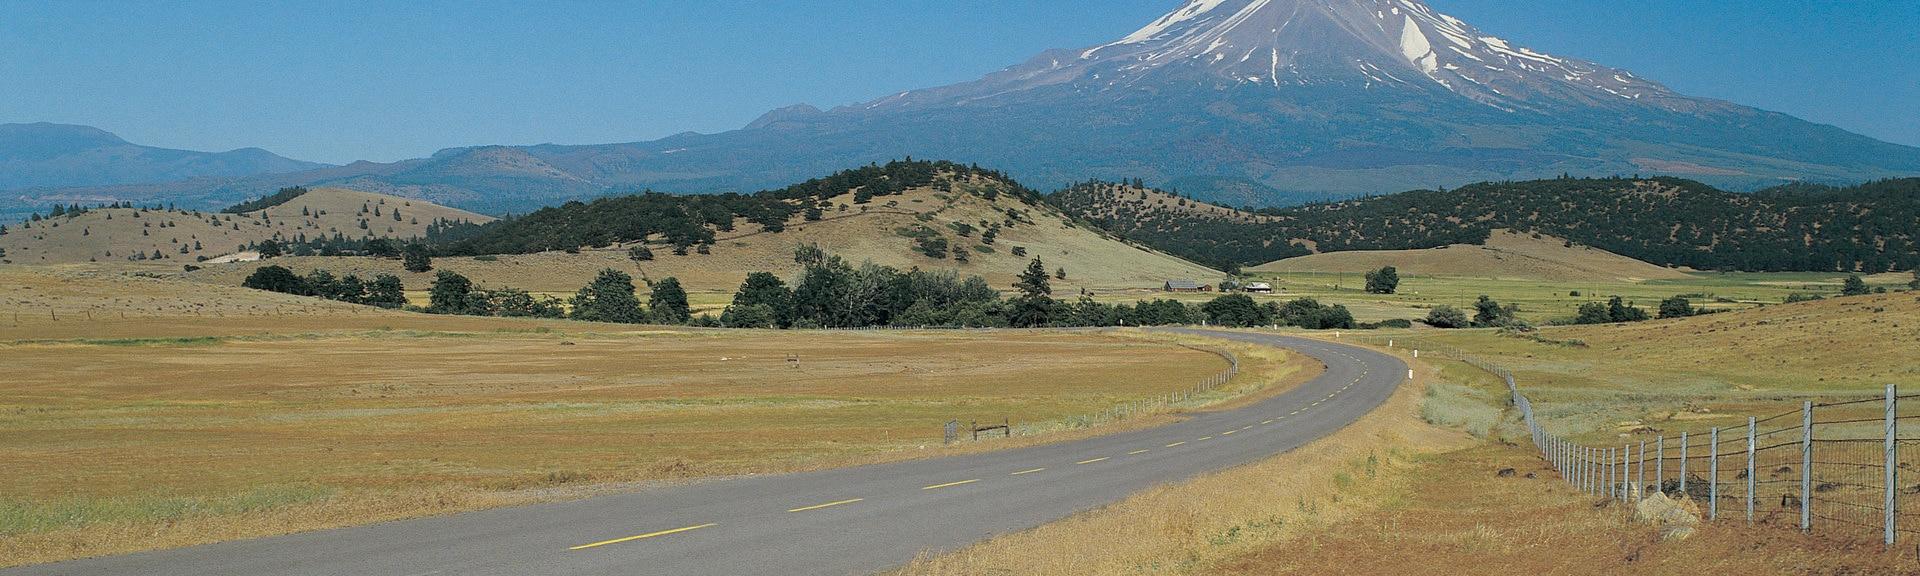 Mount Shasta, CA, USA